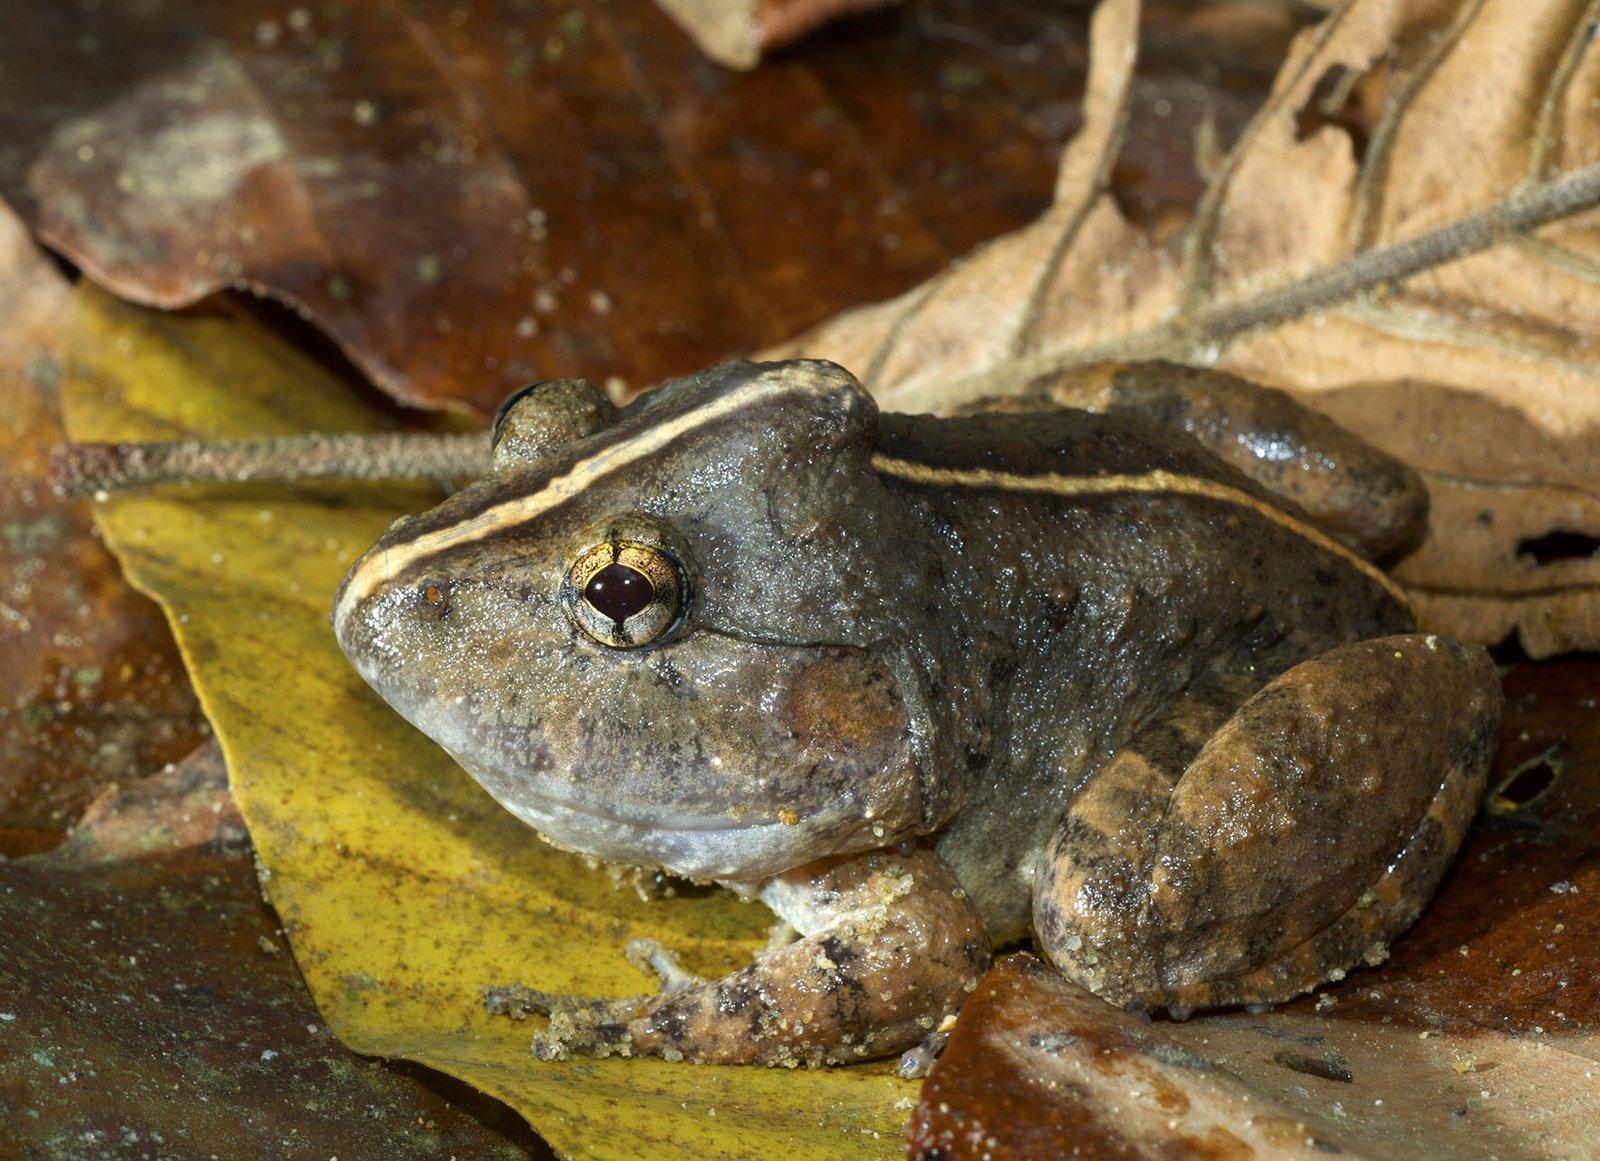 Male Fanged Frog (Limnonectes dabanus)